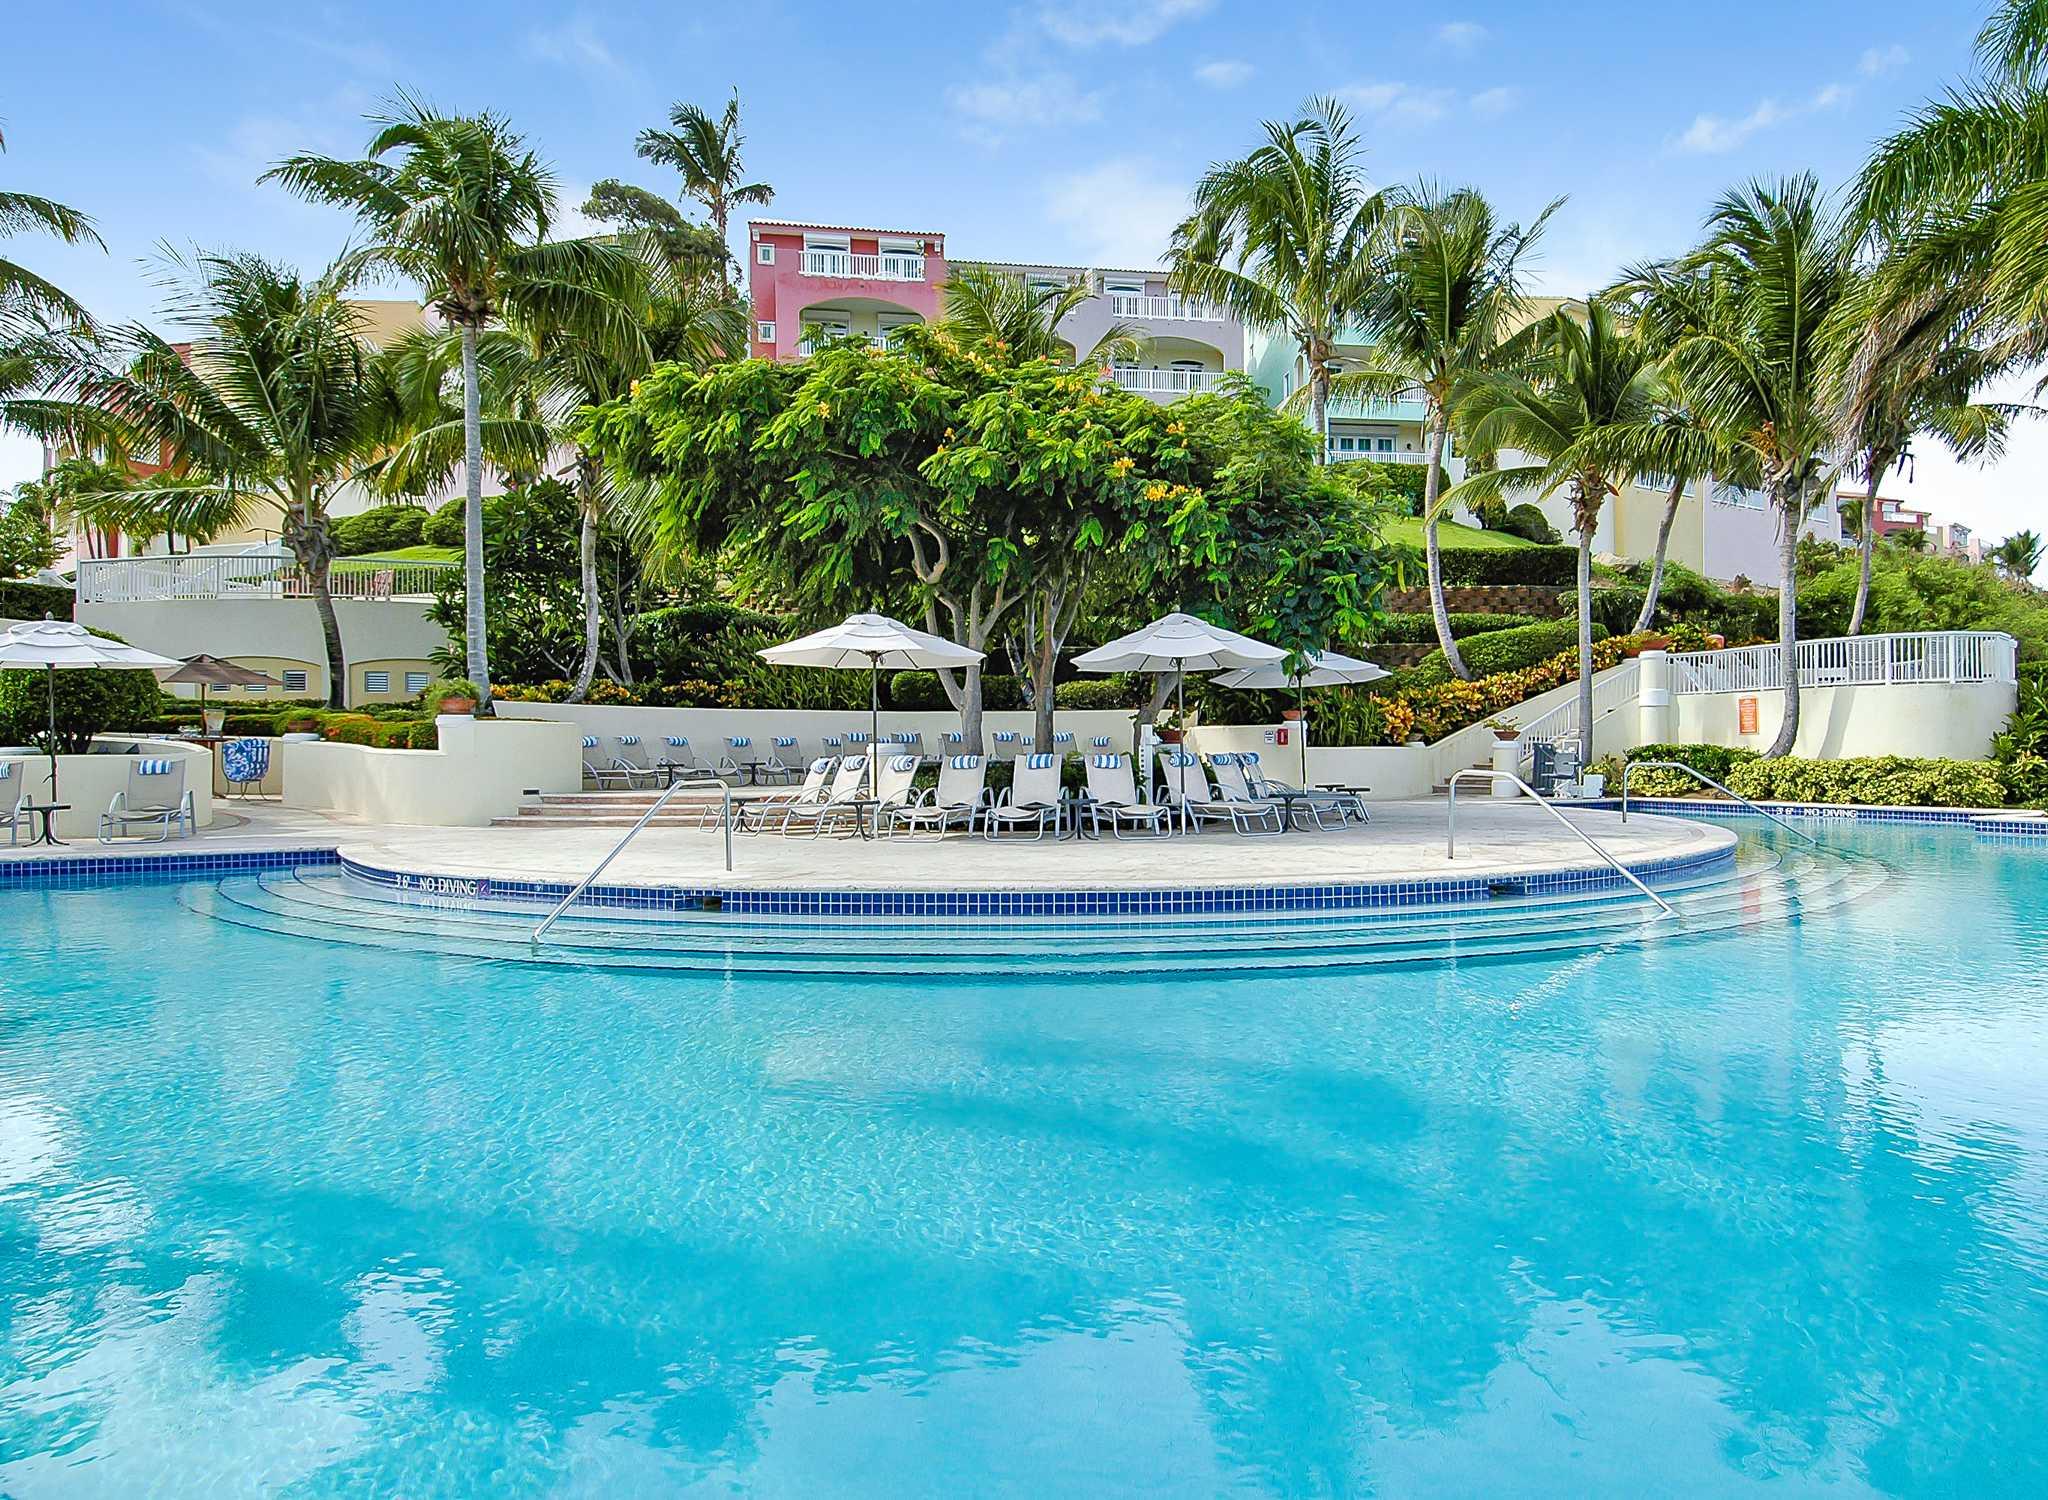 hilton worldwide hotels resorts h tels et complexes porto rico. Black Bedroom Furniture Sets. Home Design Ideas